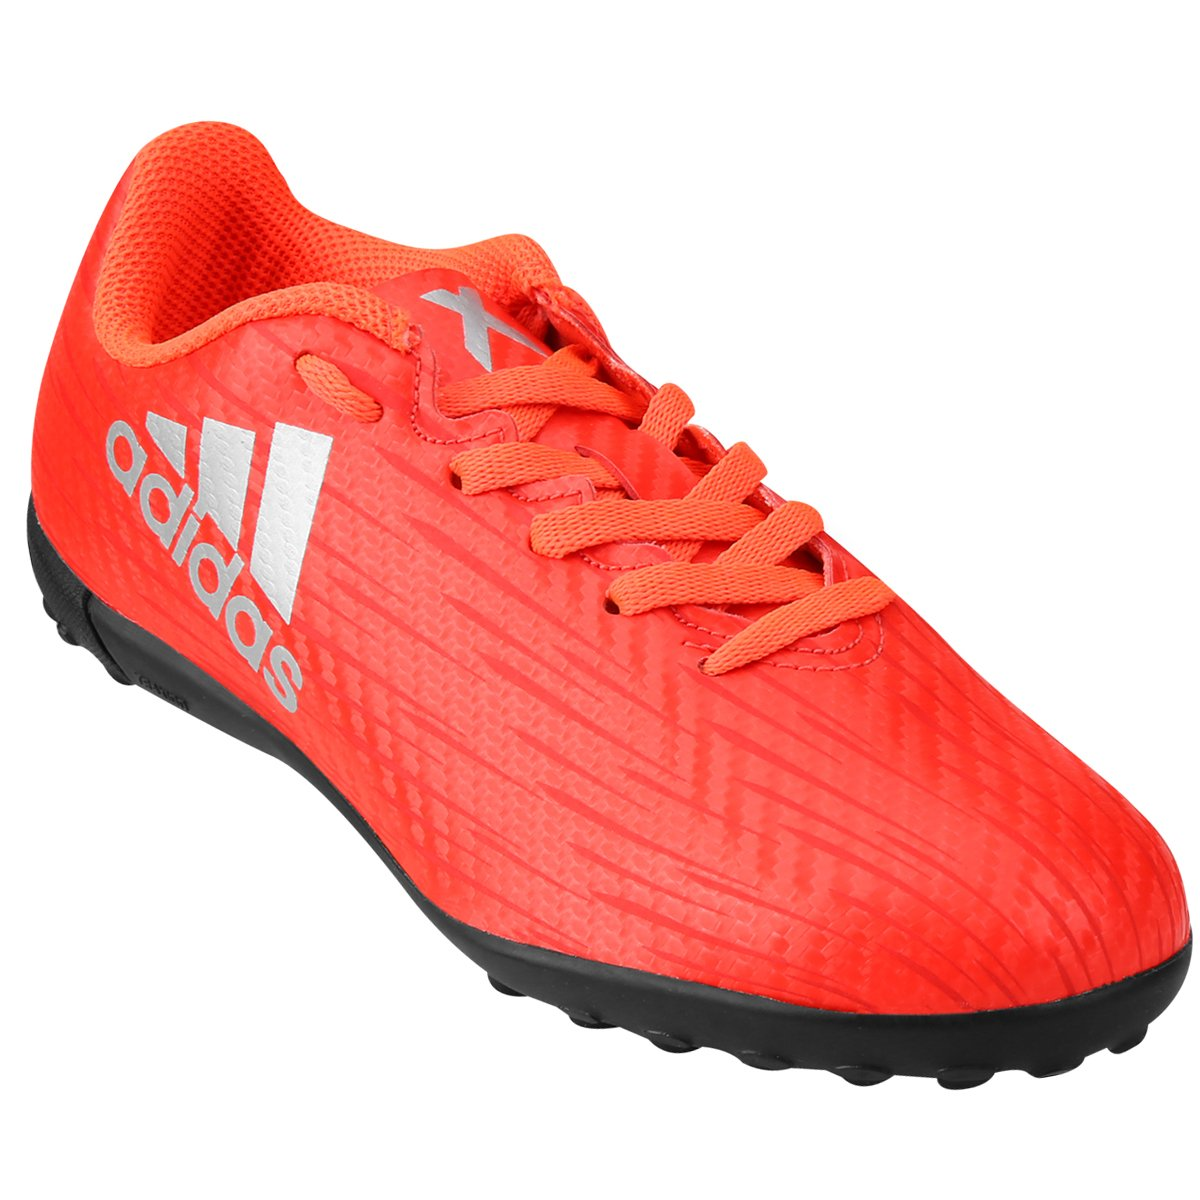 0a0ae5c9c8 Chuteira Society Infantil Adidas X 16.4 TF